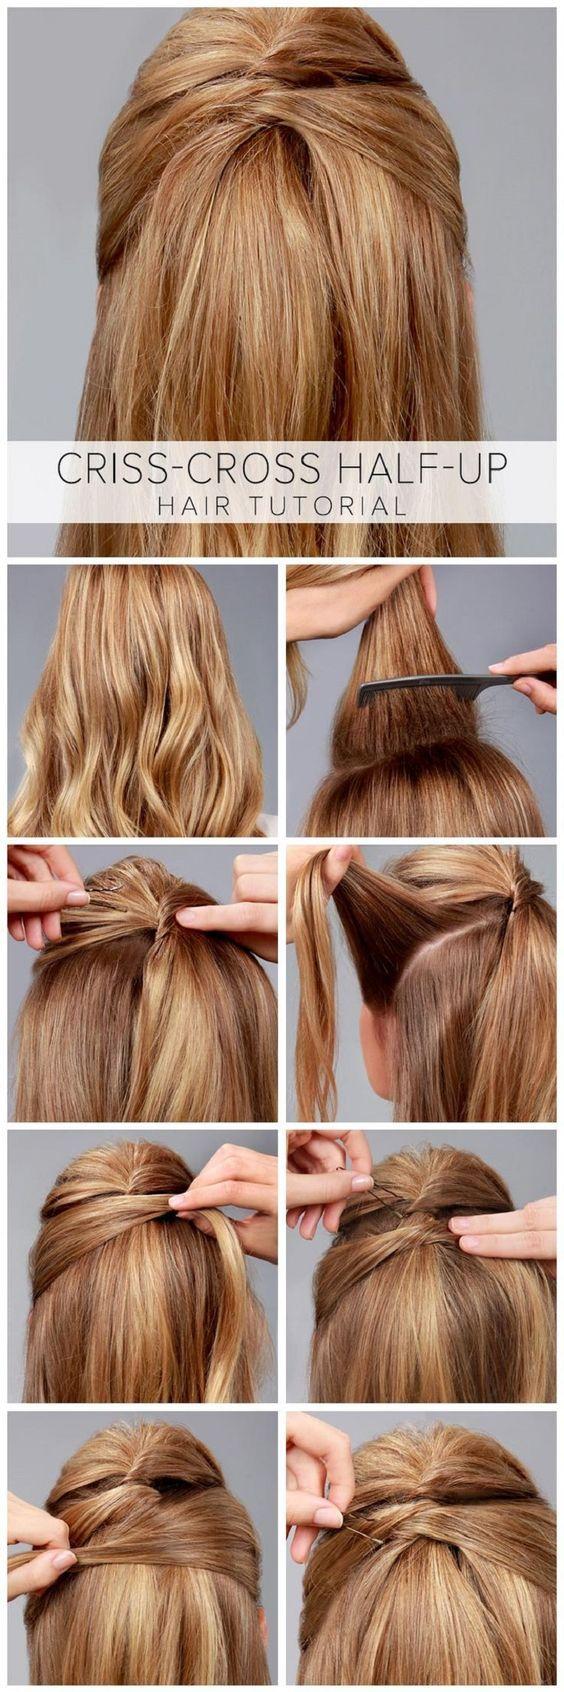 best 25+ interview hairstyles ideas on pinterest | office hair